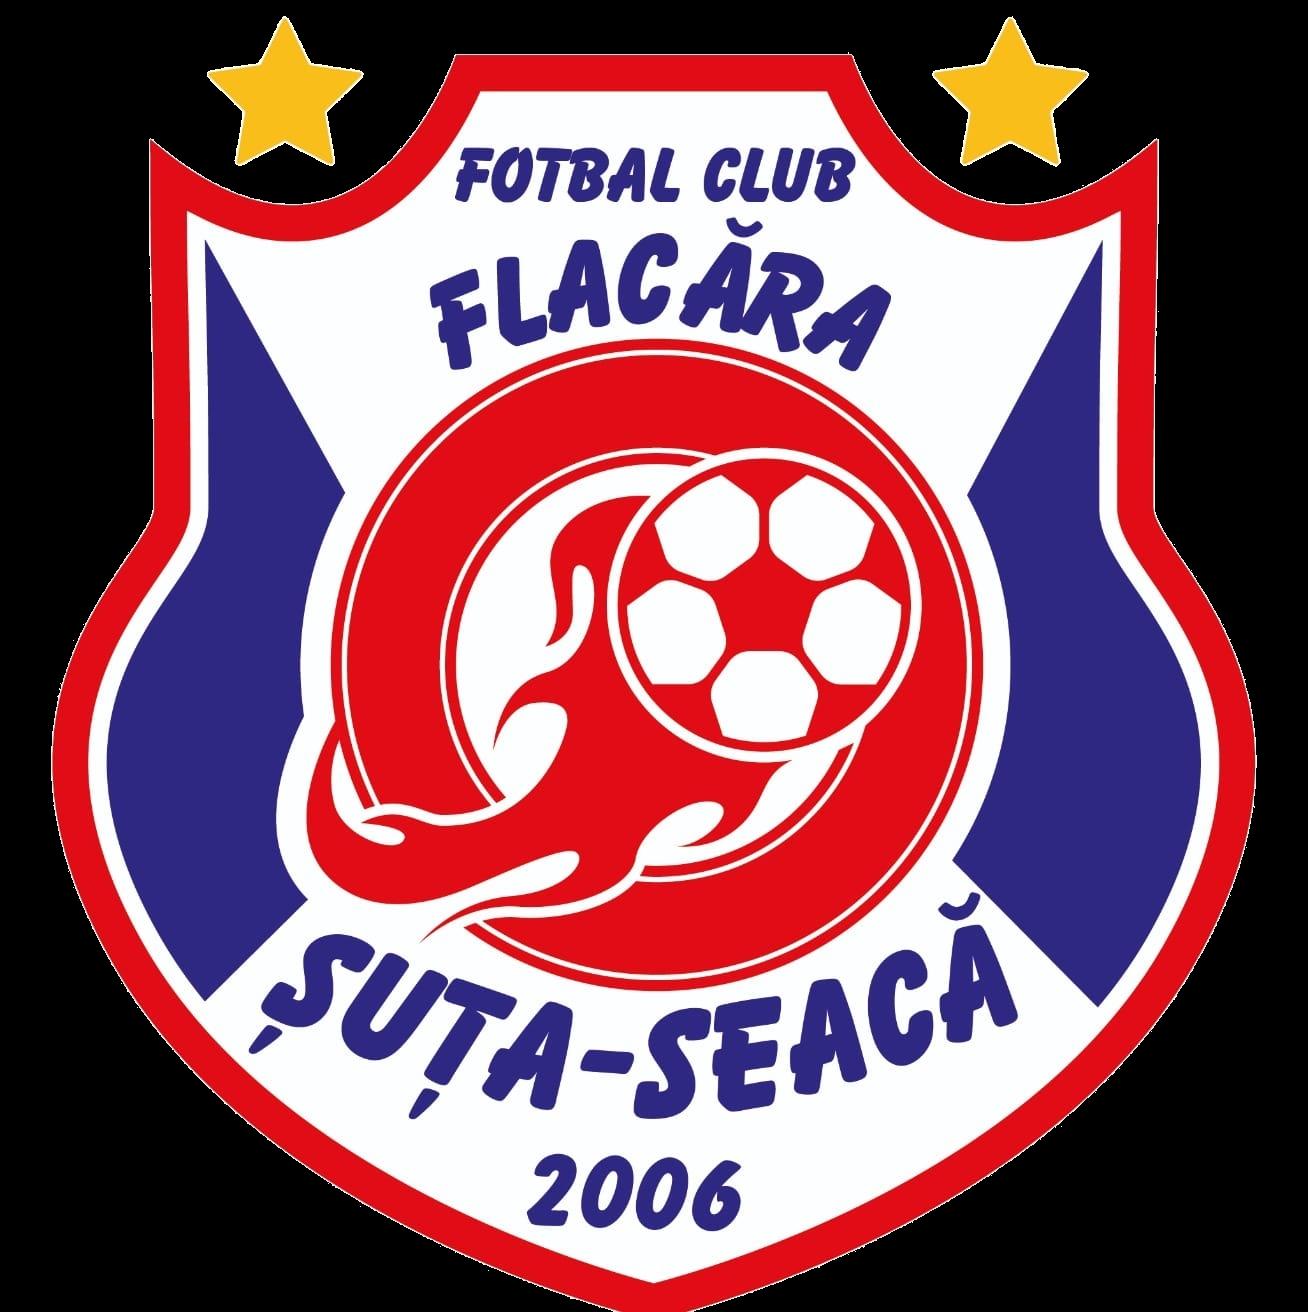 F.C. Flacara Suta Seaca